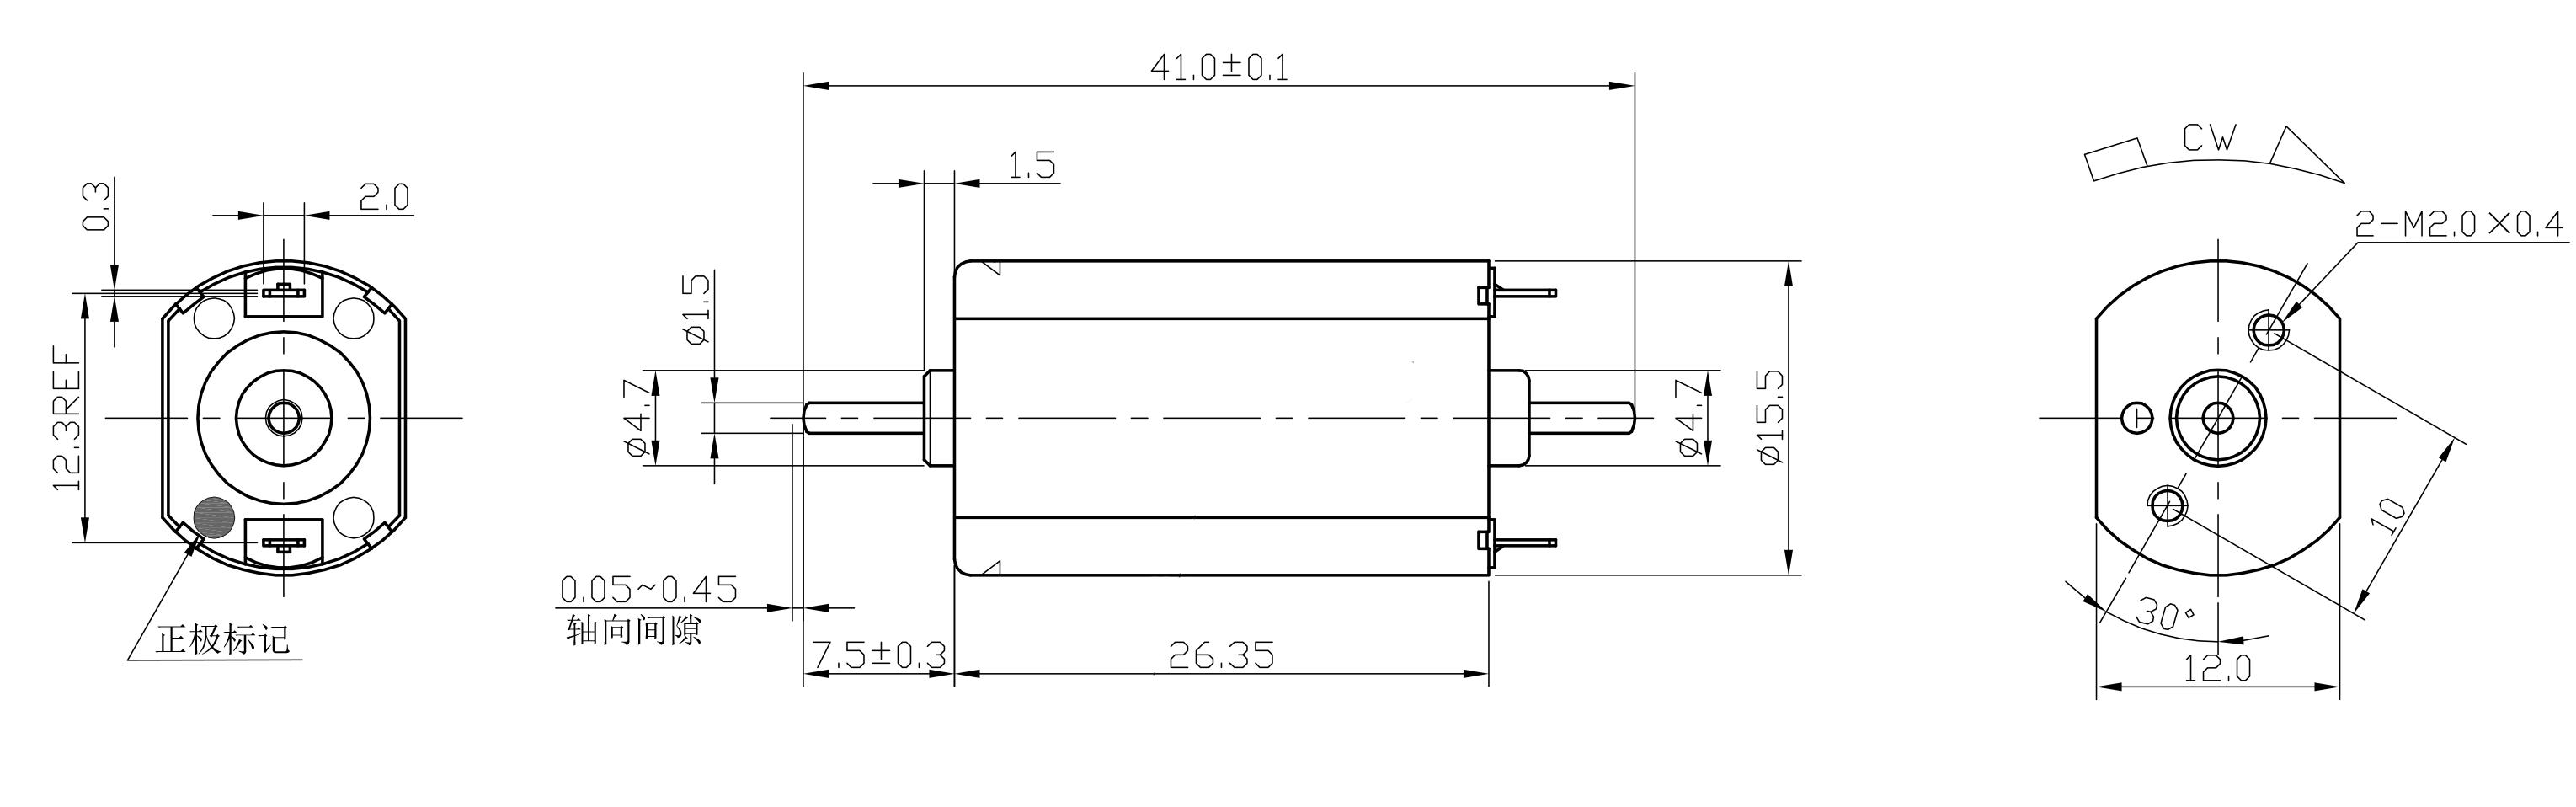 micro motor drawing